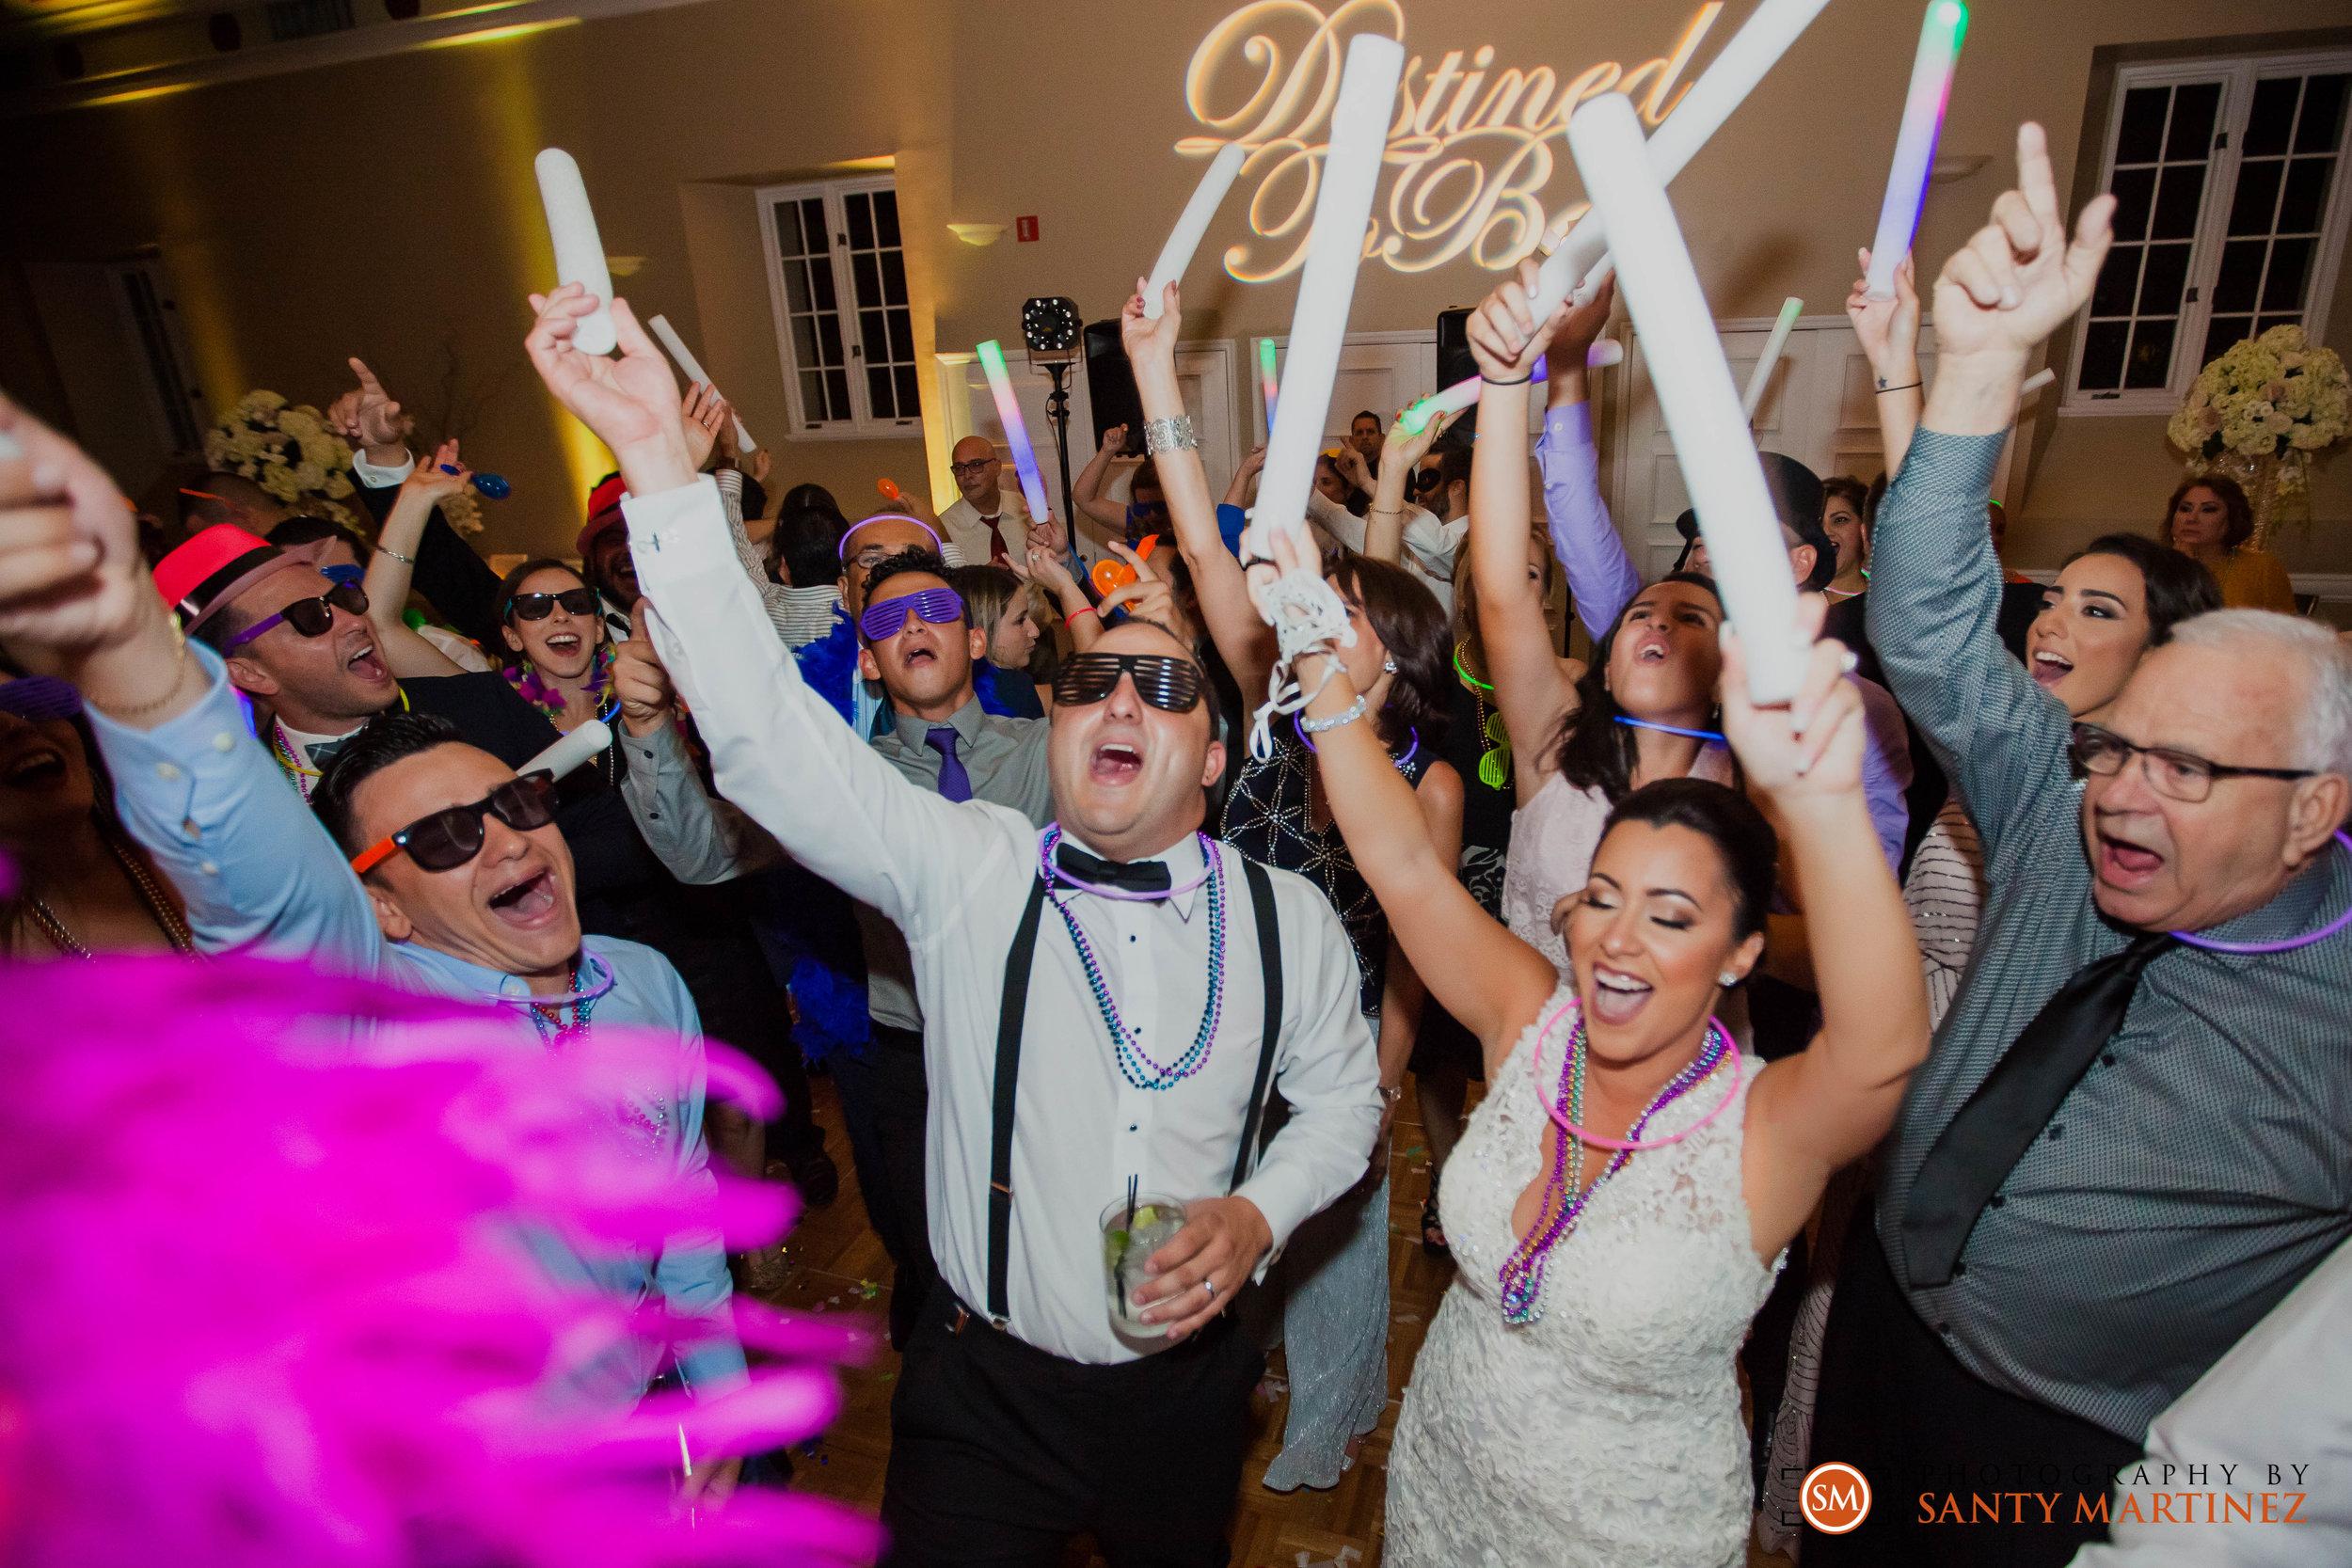 Wedding Douglas Entrance - Photography by Santy Martinez-56.jpg